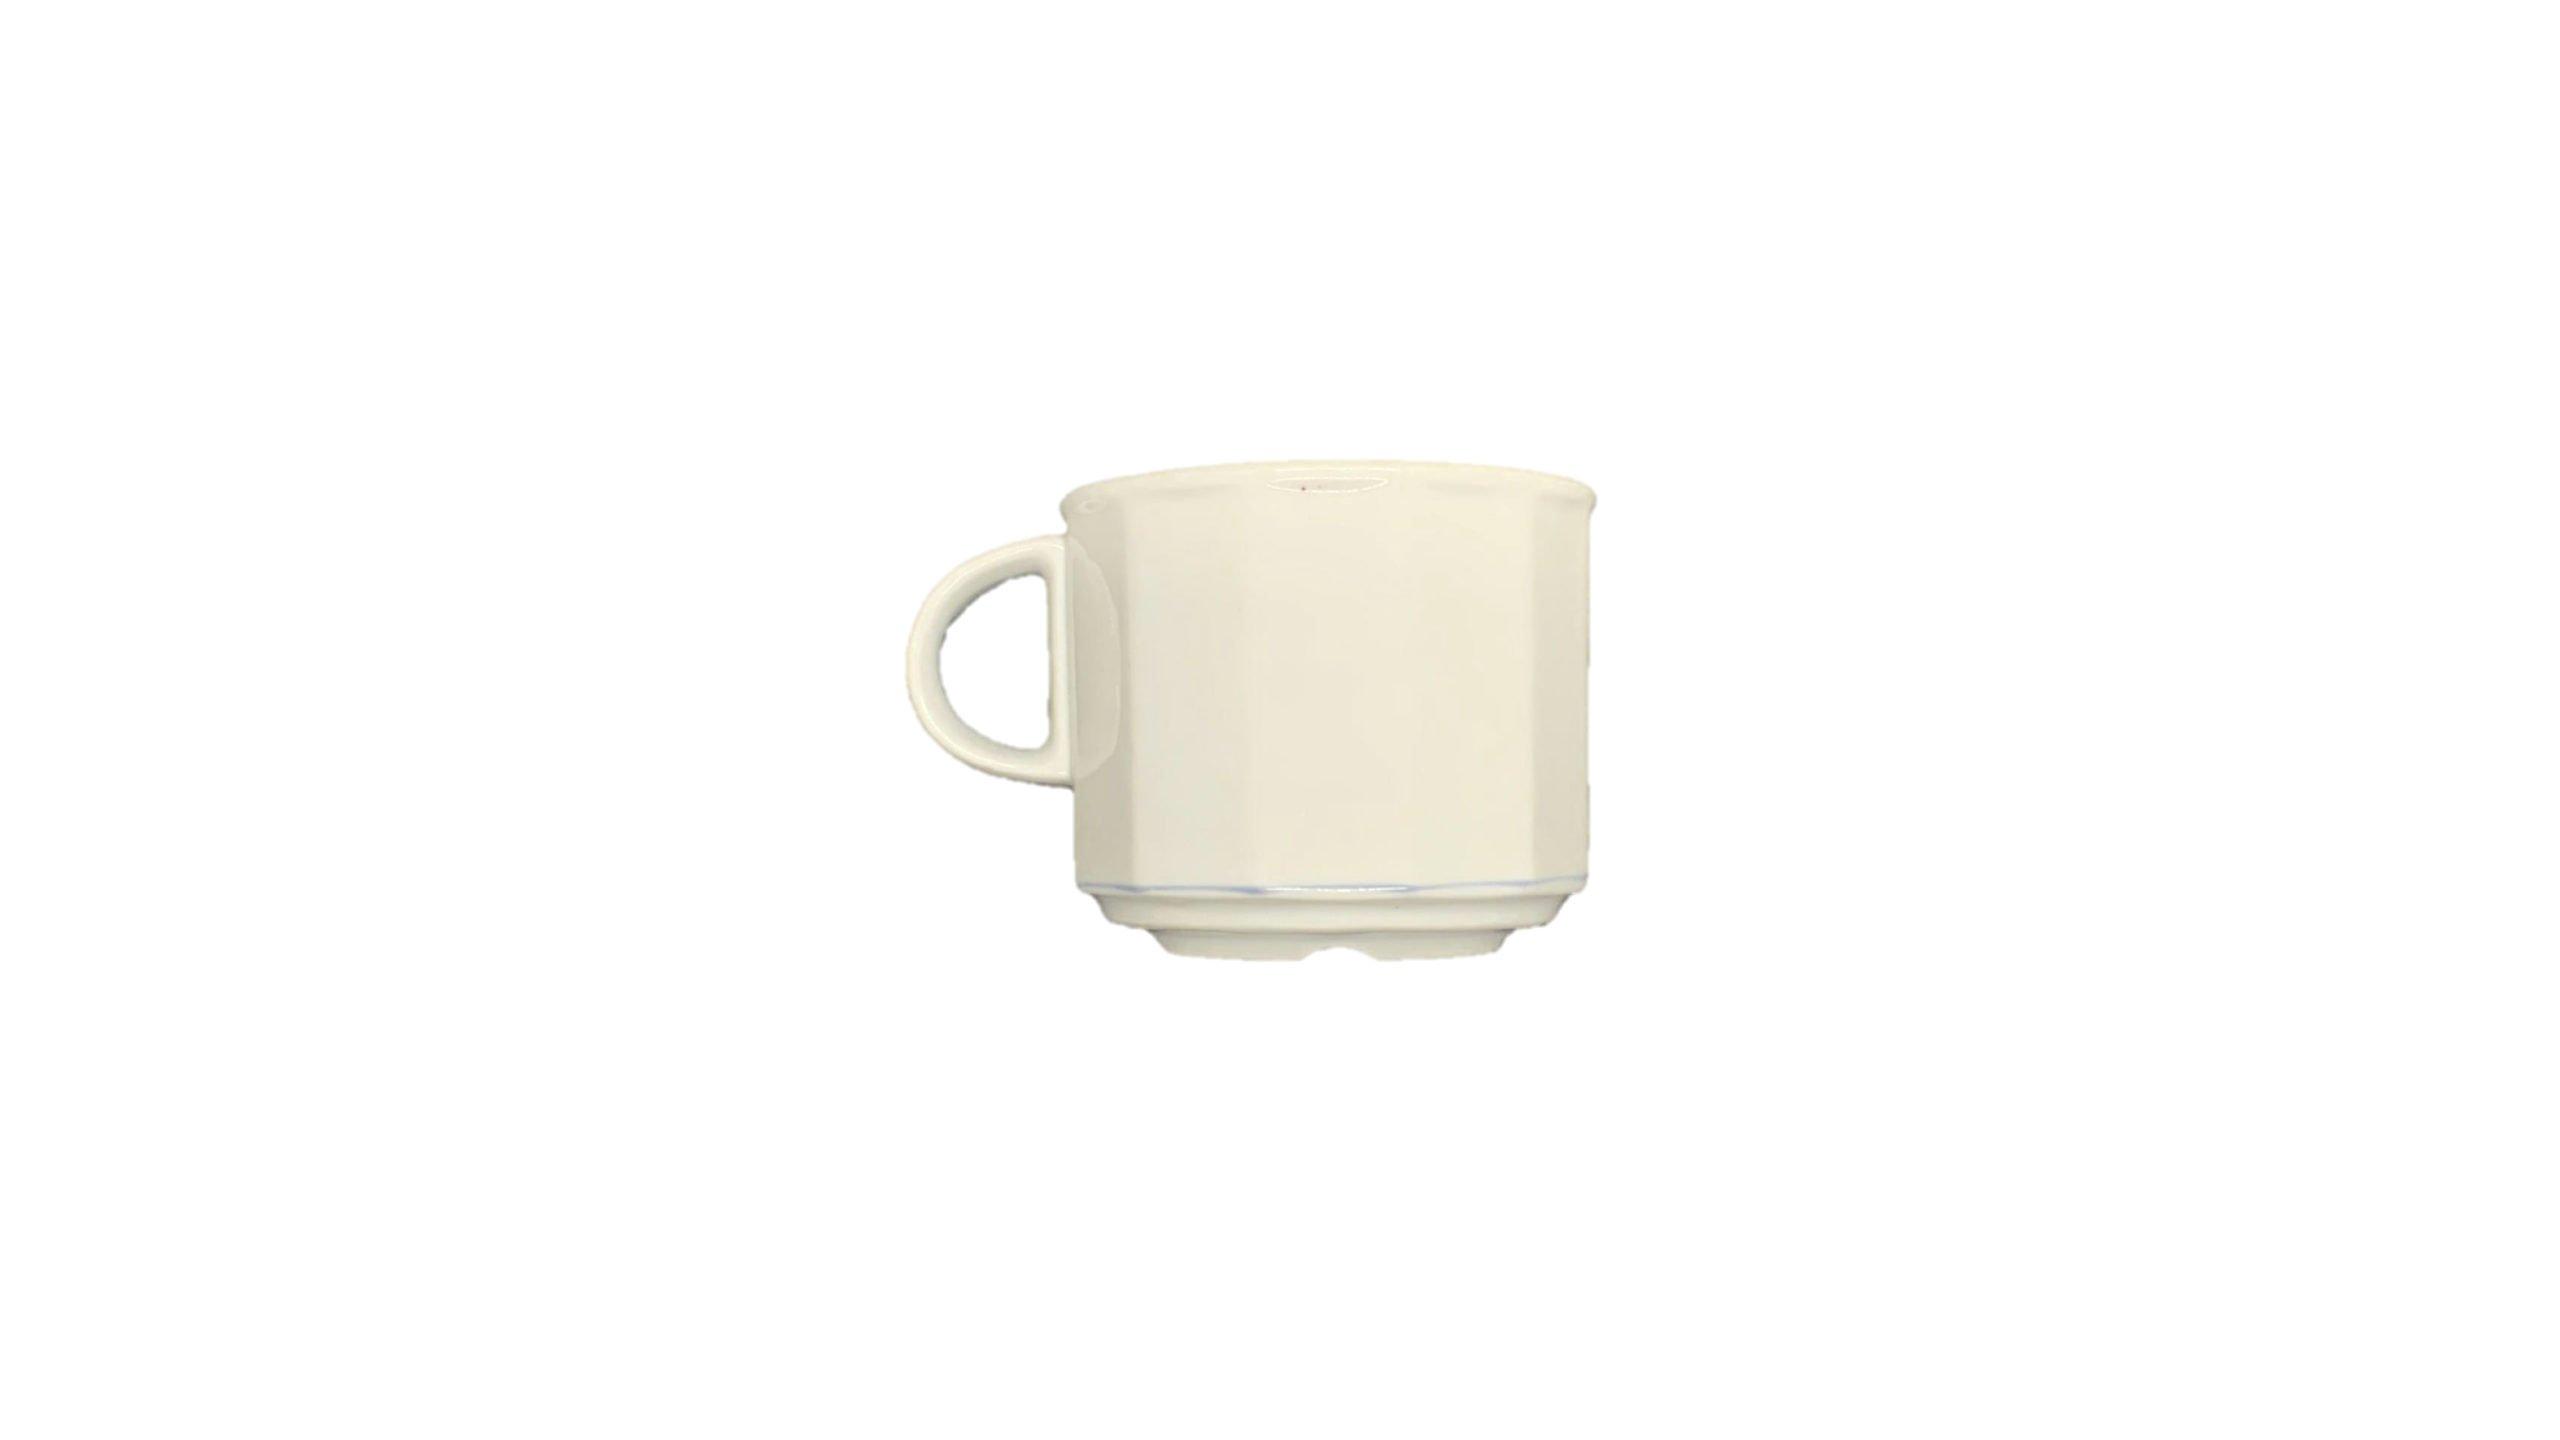 koffietas-hoekig-829